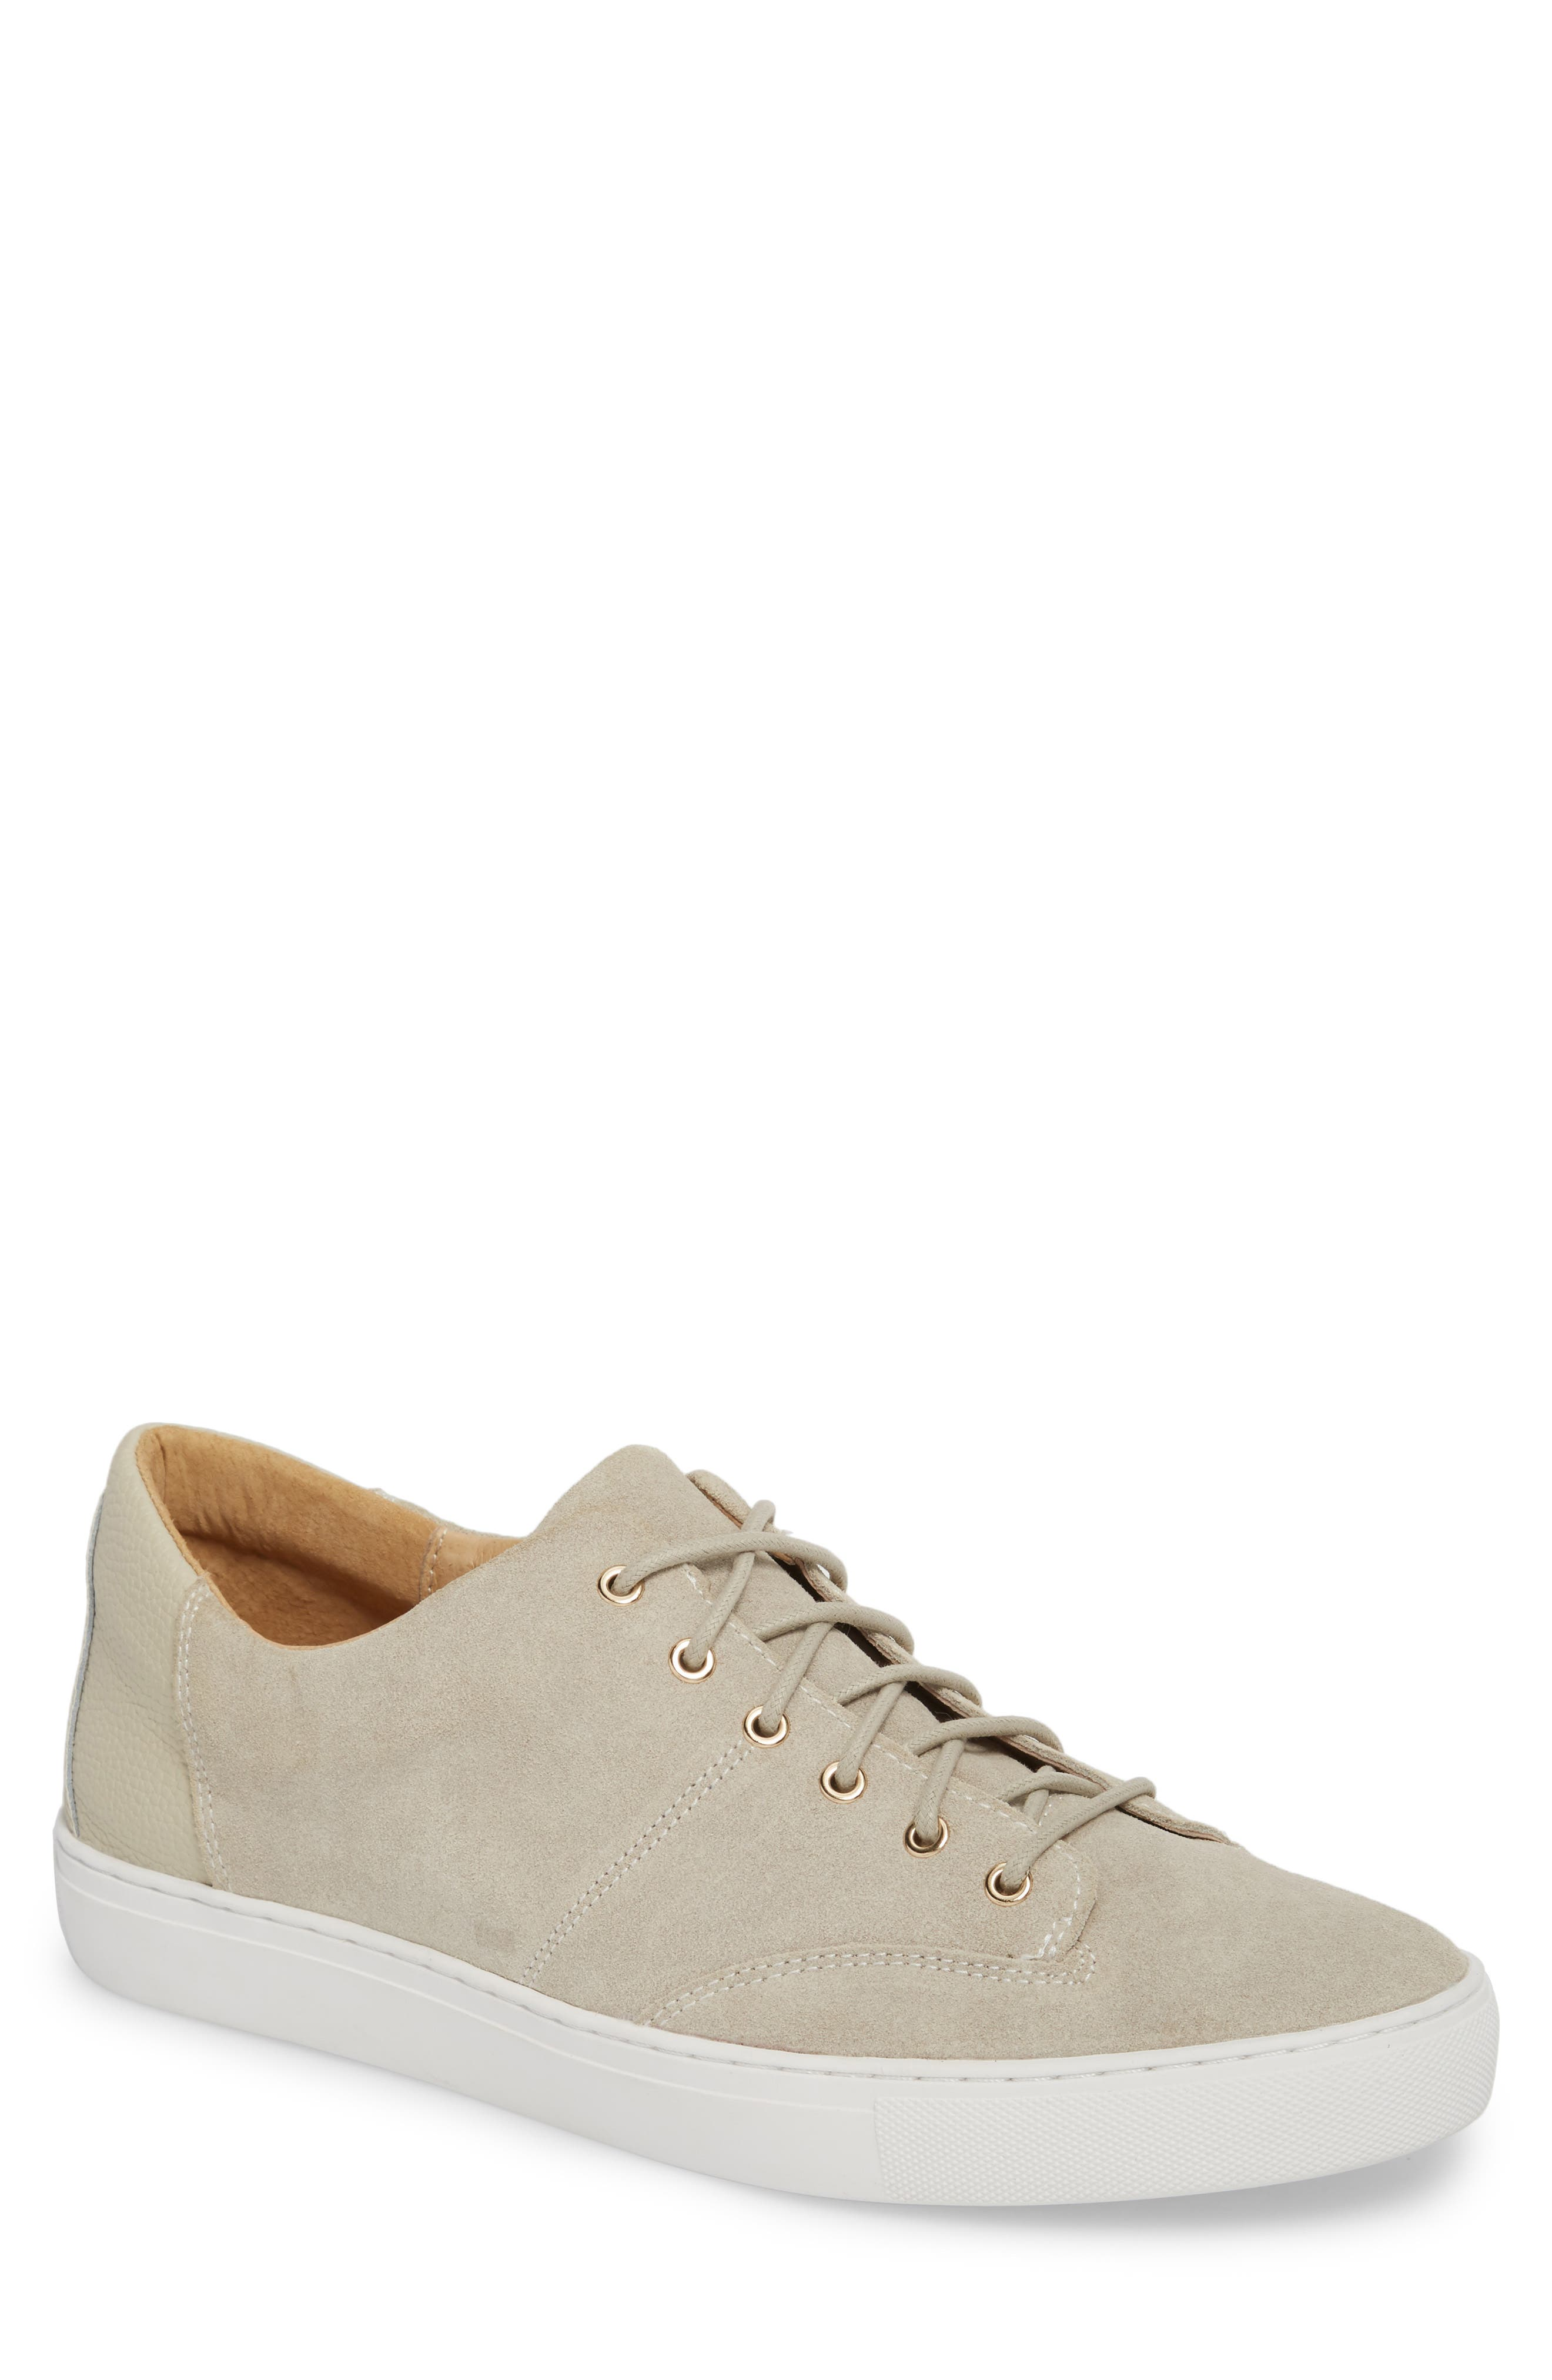 Cooper Sneaker,                             Main thumbnail 2, color,